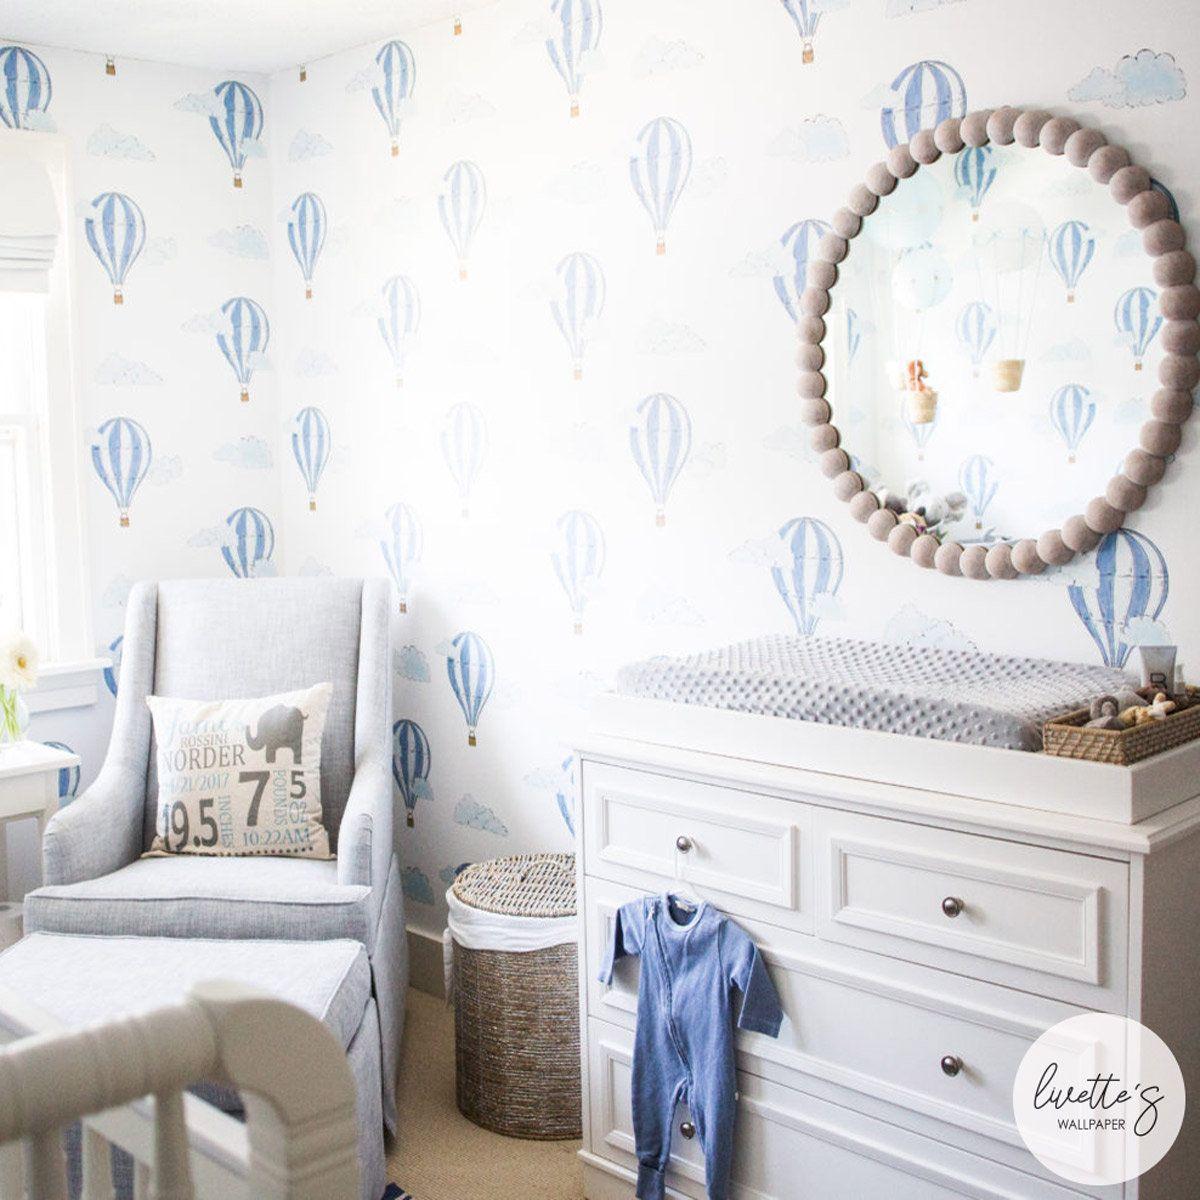 Watercolor Air Balloon Removable Wallpaper Baby Boys Nursery Etsy Nursery Wallpaper Boy Boys Room Wallpaper Nursery Room Boy